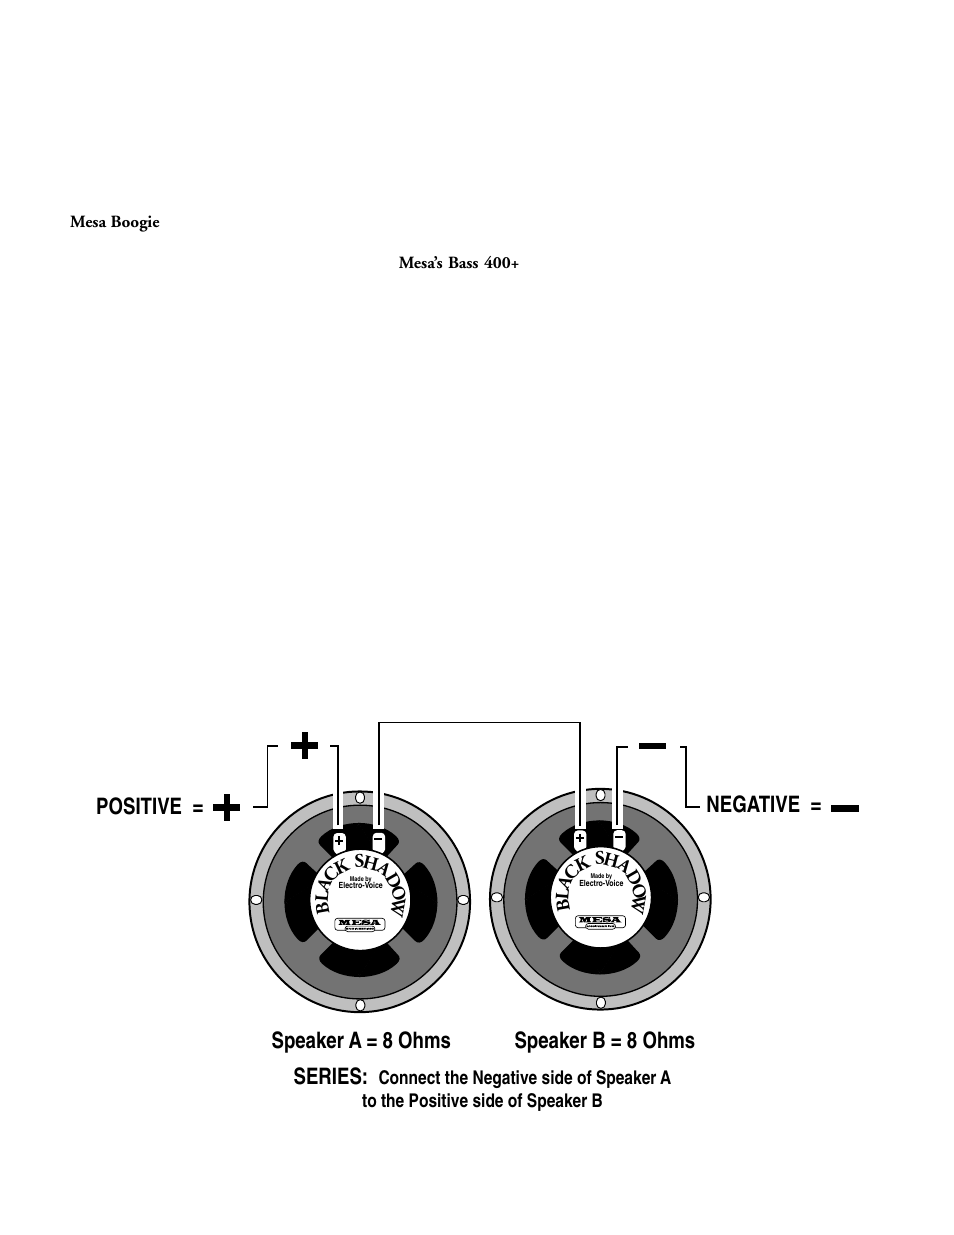 medium resolution of speaker a 8 ohms speaker b 8 ohms series positive negative mesa boogie mark 1 user manual page 16 30